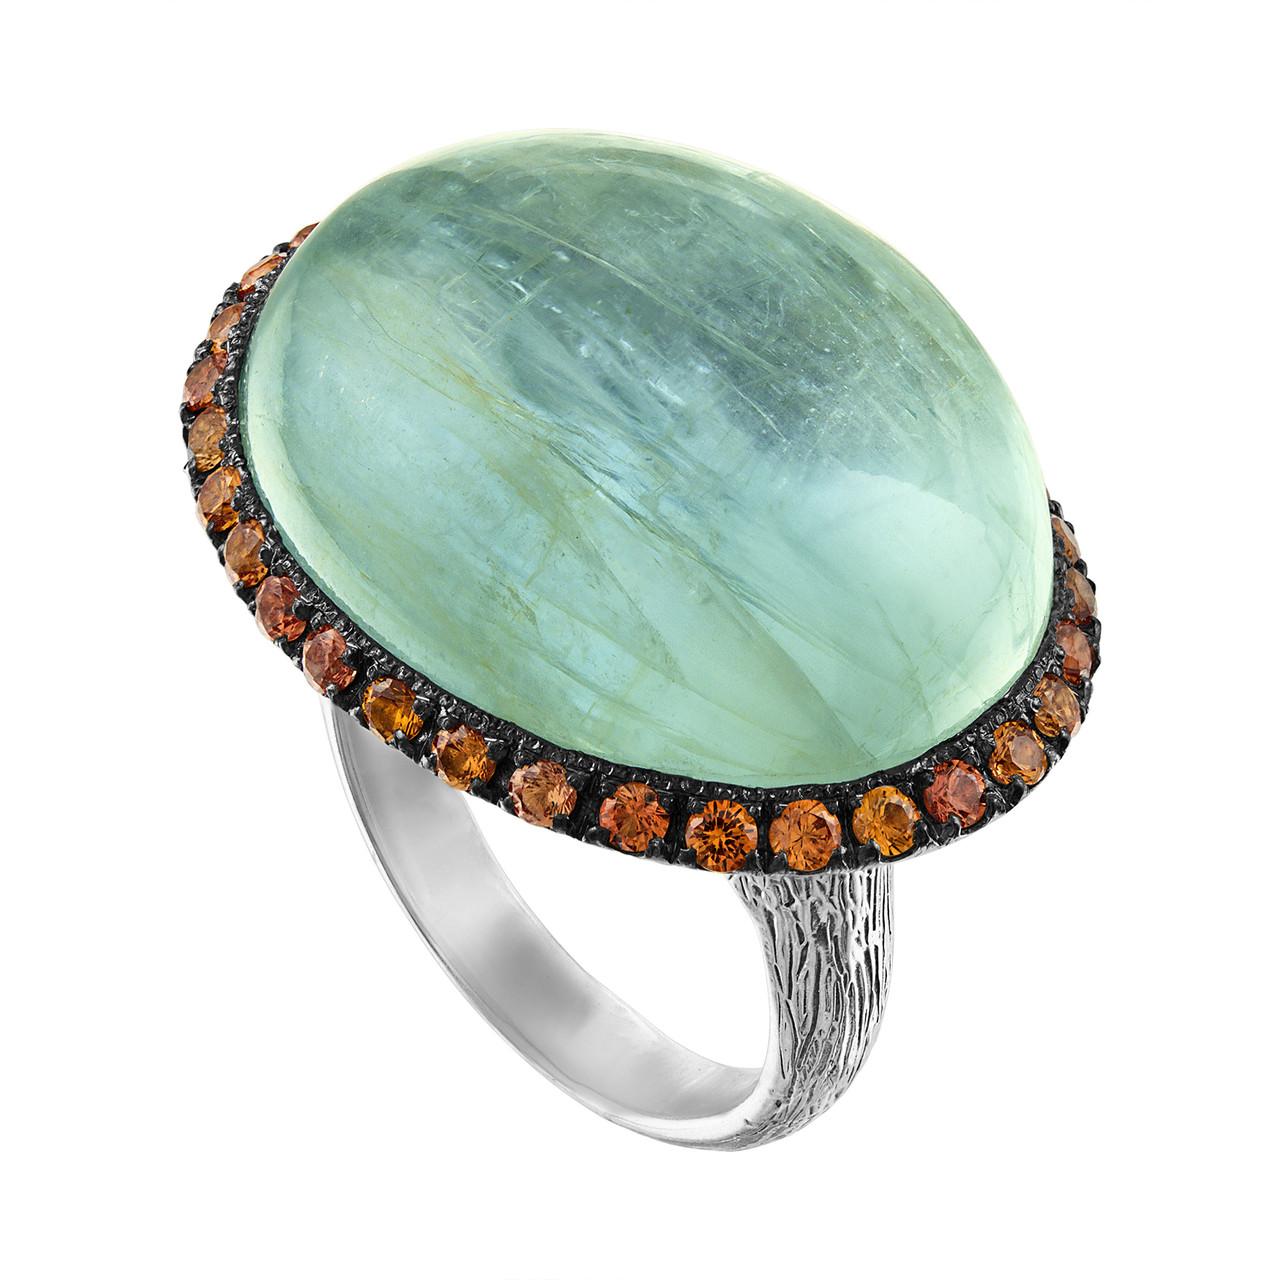 multi gemstone Full Eternity Band ring,Anniversary,birthstone ring,gemstone ring,Christmas,sapphire,labradorite,ruby,chalcedony,cocktail,